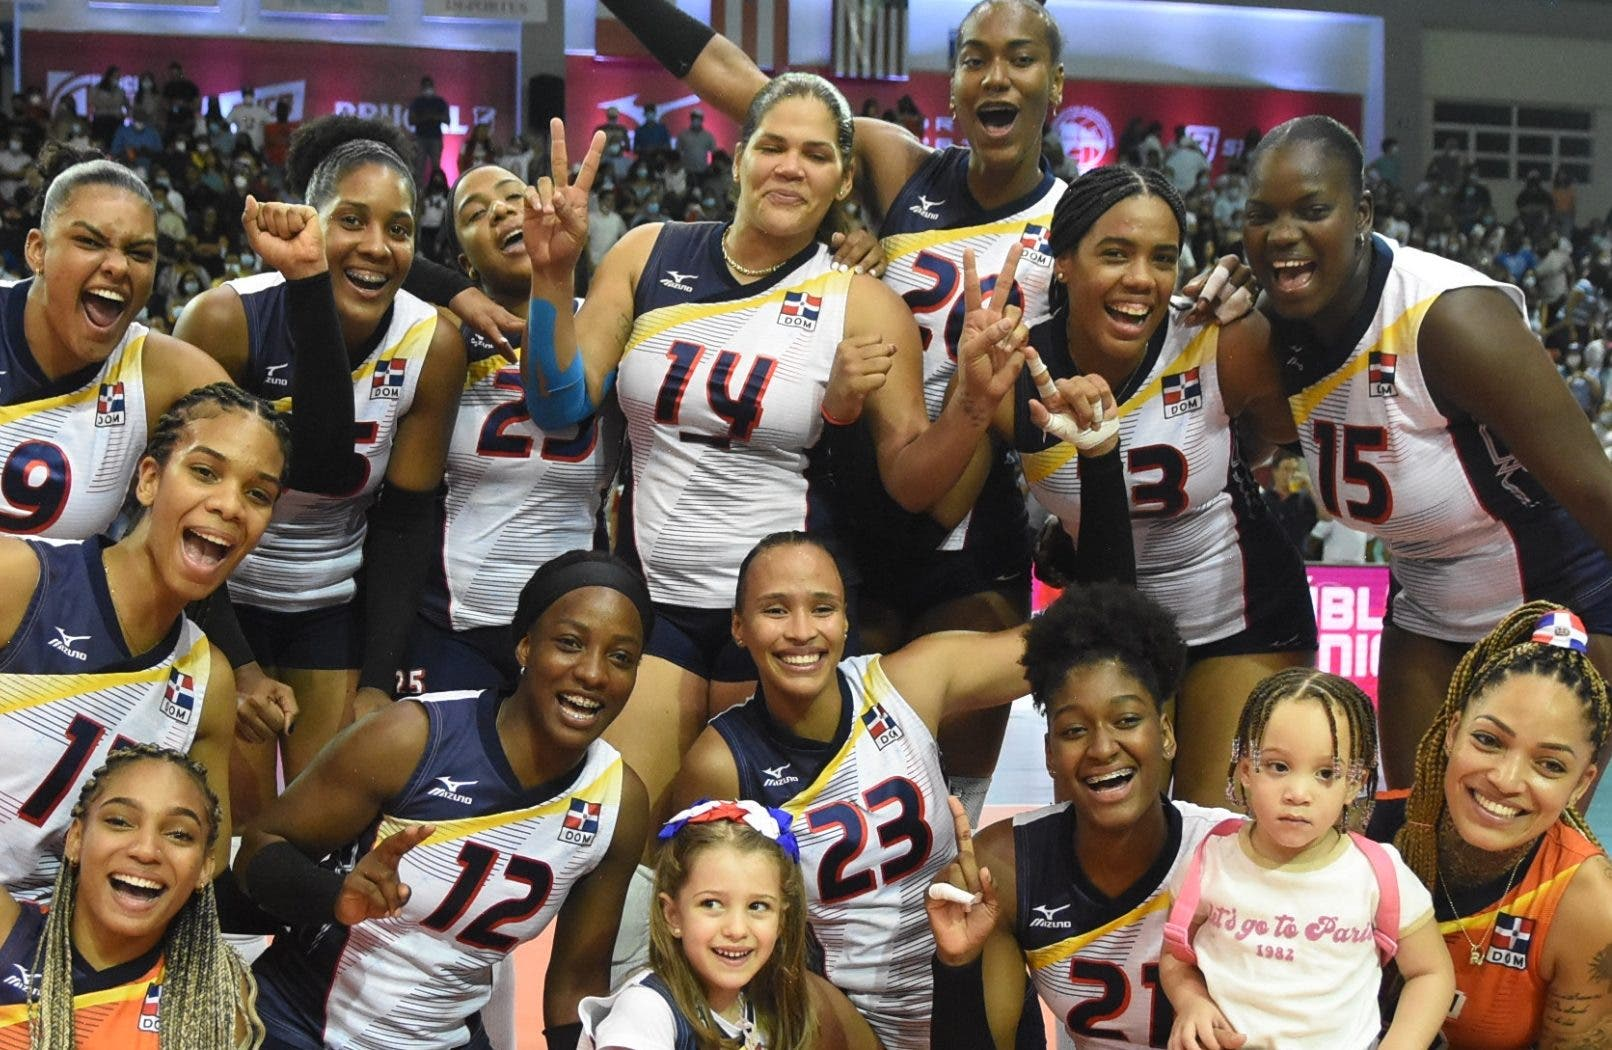 Dominicana ¡campeón!:  Voleibol RD logra 5to. oro Copa Panam; Rivera se va